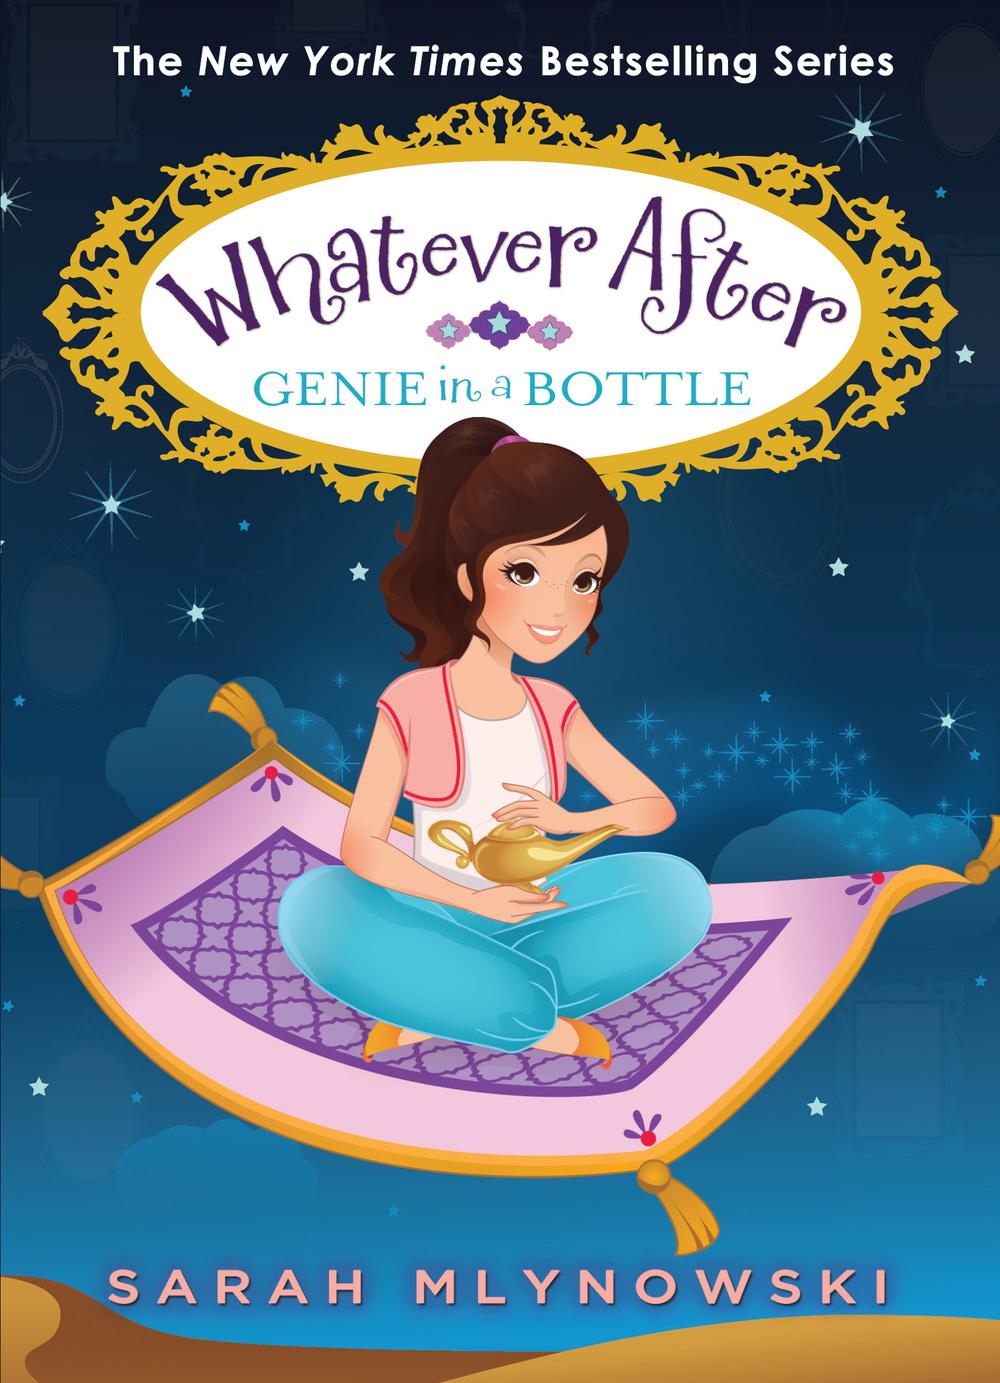 sarah-mlynowski-whatever-after-genie-bottle.jpg